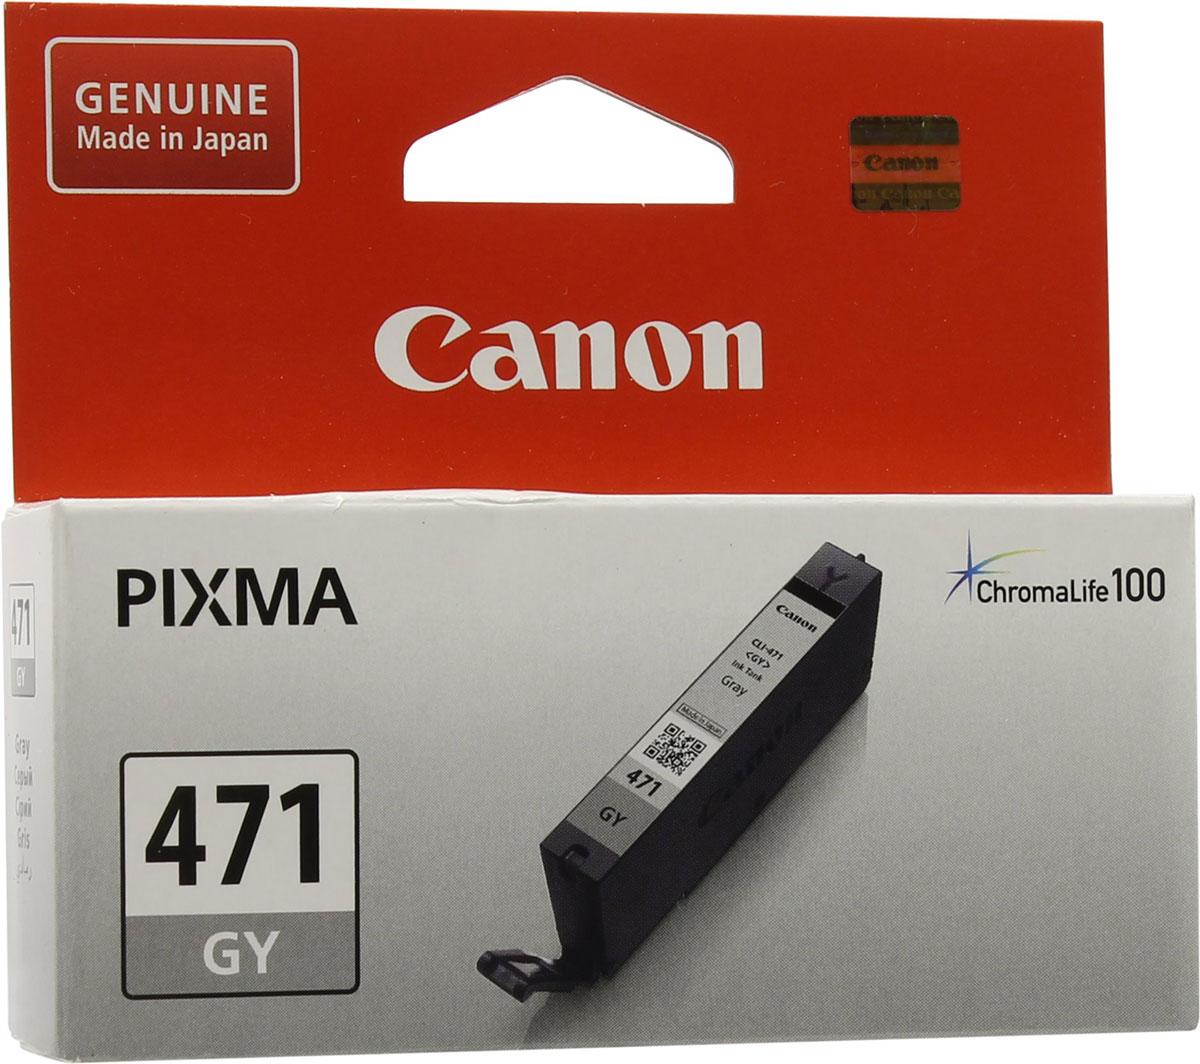 Фото - Canon CLI-471, Grey картридж для MG7740 meike fc 100 for nikon canon fc 100 macro ring flash light nikon d7100 d7000 d5200 d5100 d5000 d3200 d310